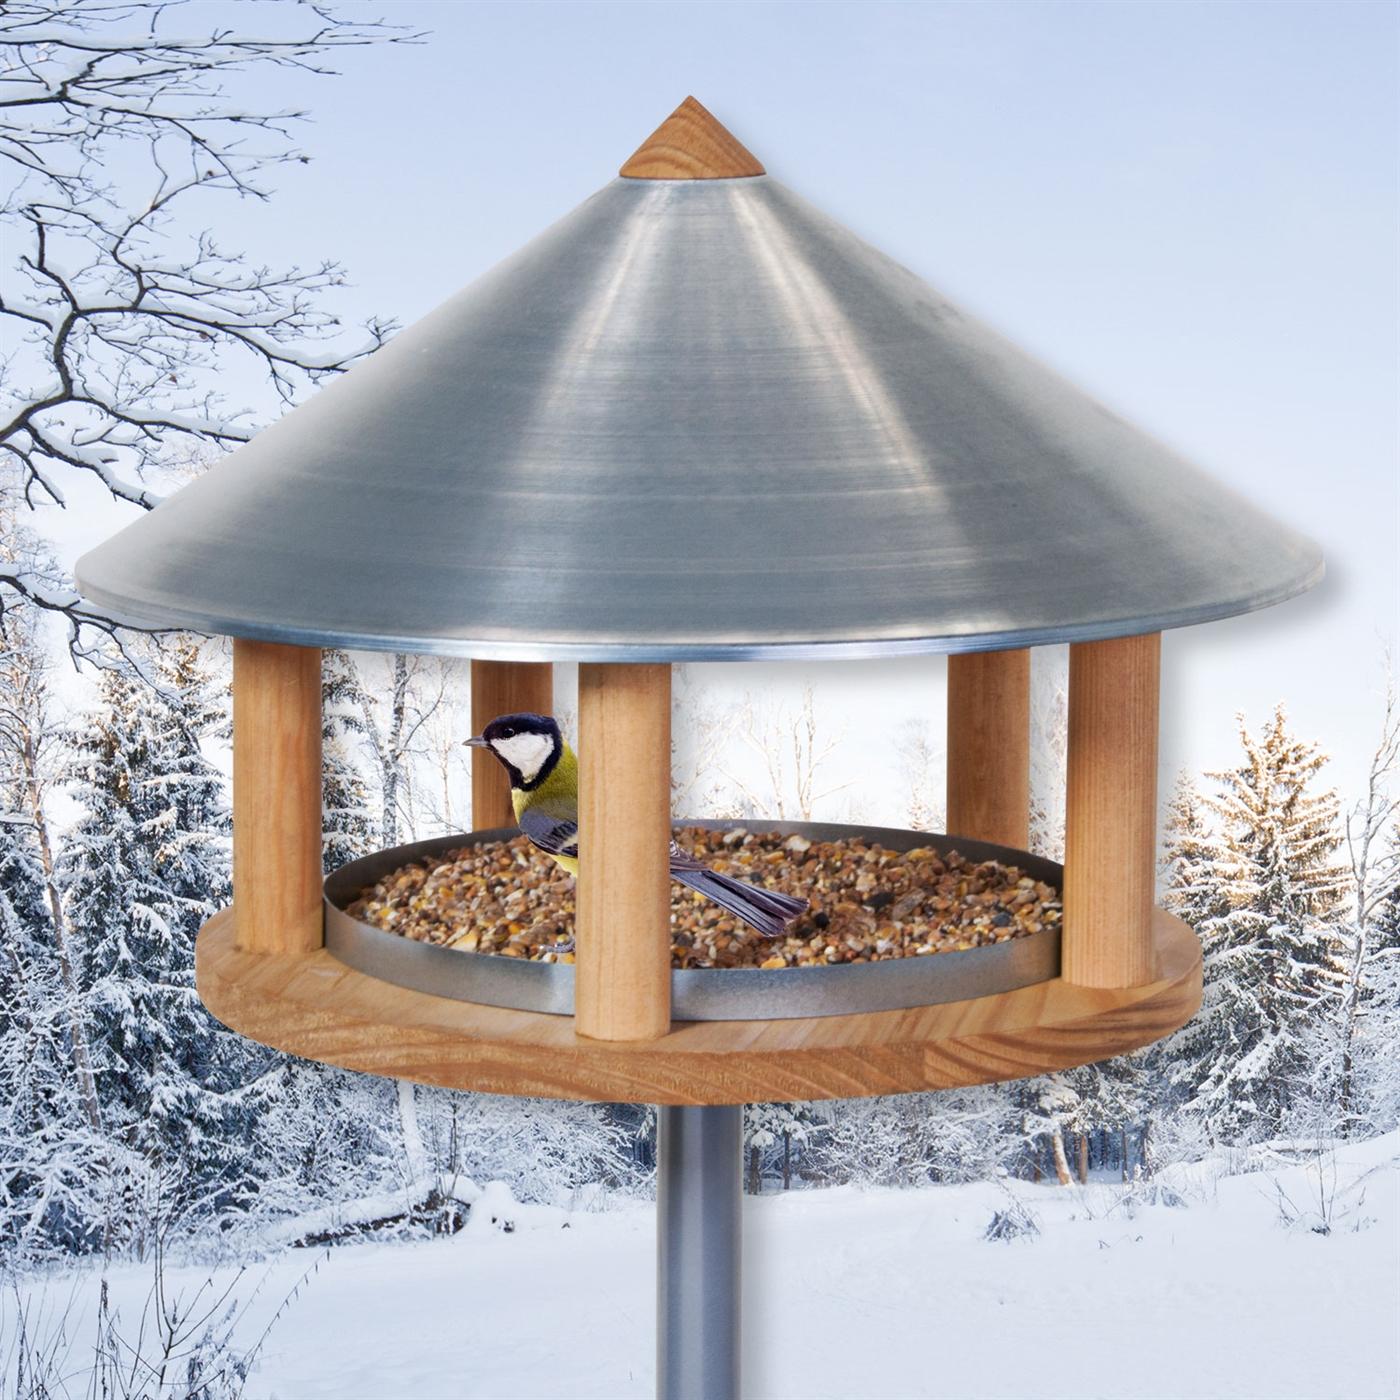 vogelhaus roskilde d nisches design vogelfutterhaus. Black Bedroom Furniture Sets. Home Design Ideas